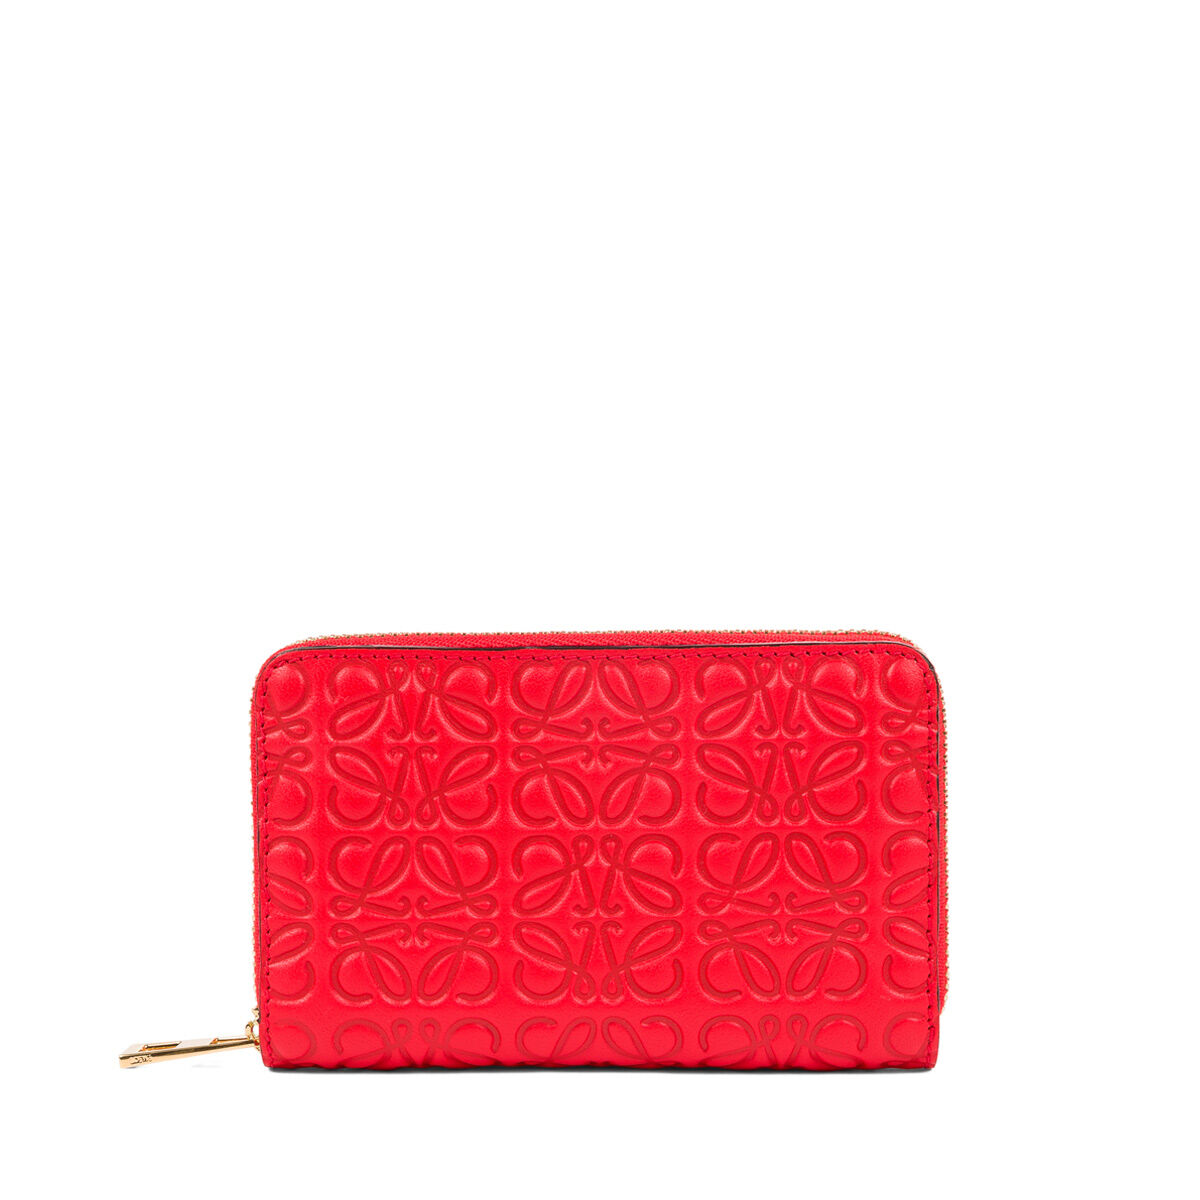 LOEWE Zip Card Holder Primary Red all